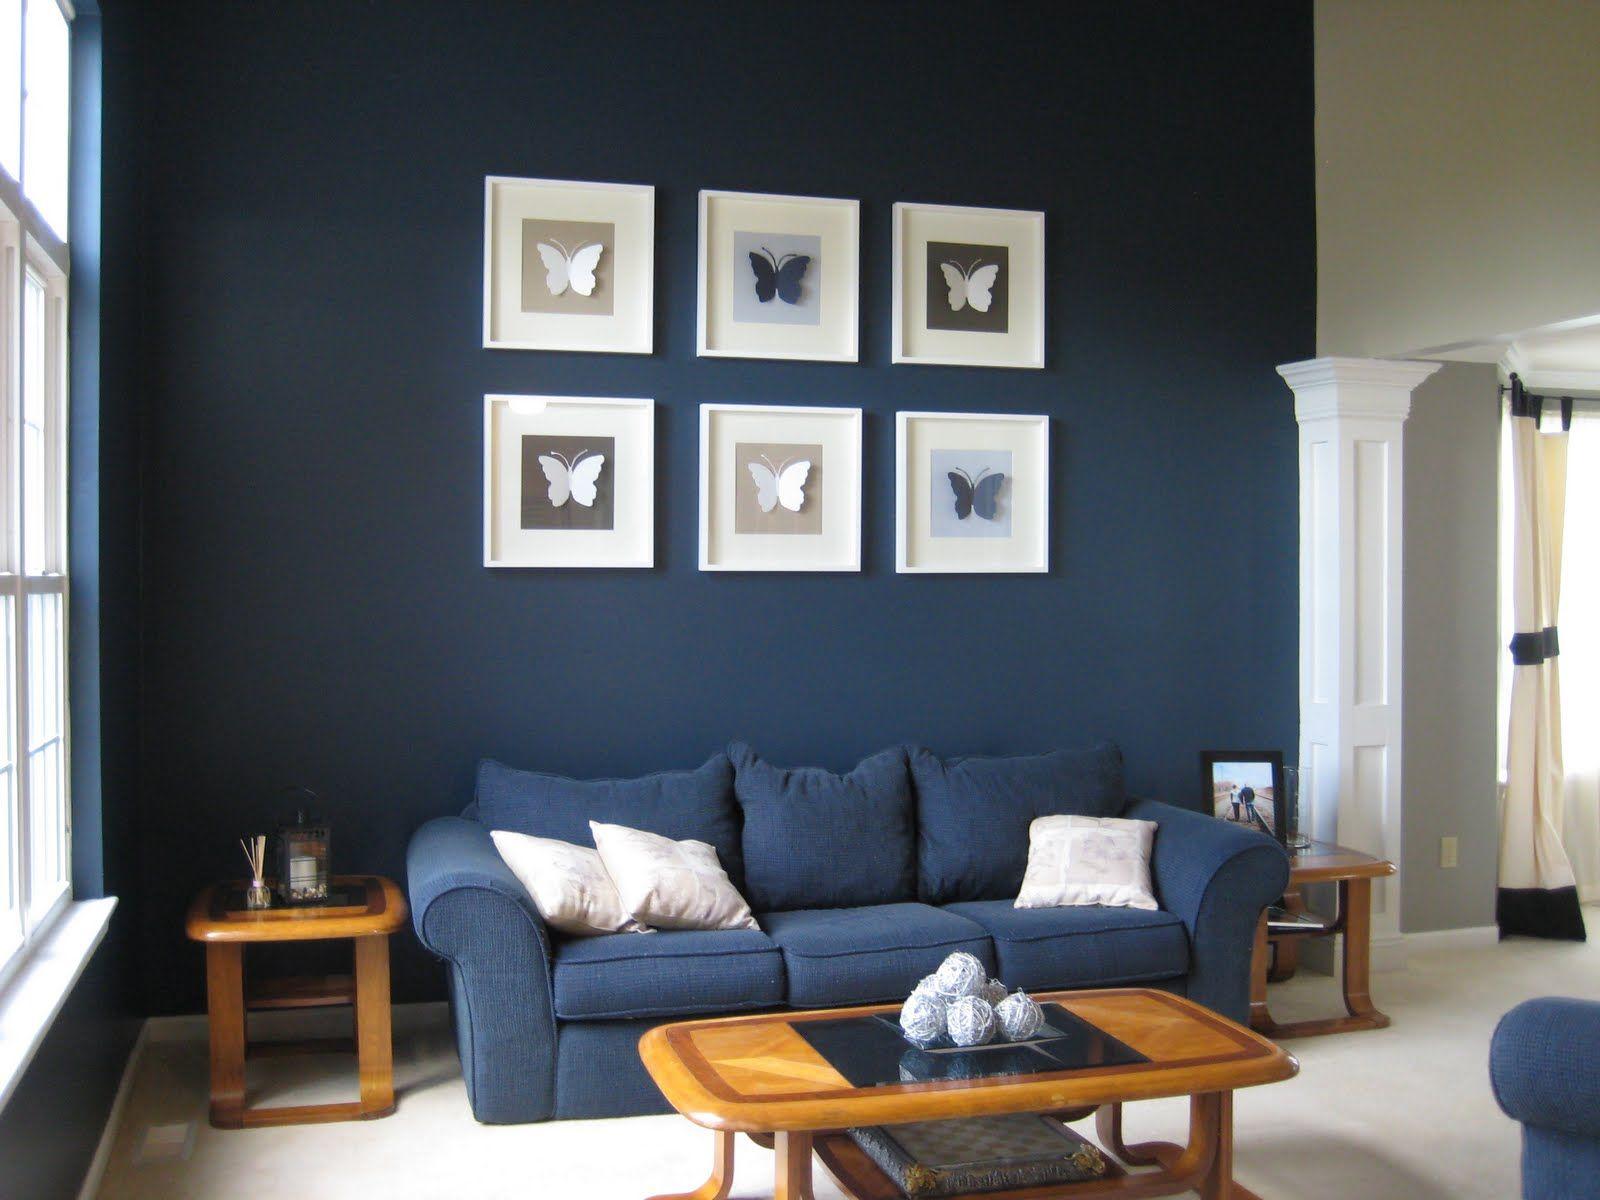 Painting Room With Hues Of Blue Con Imagenes Sala De Estar